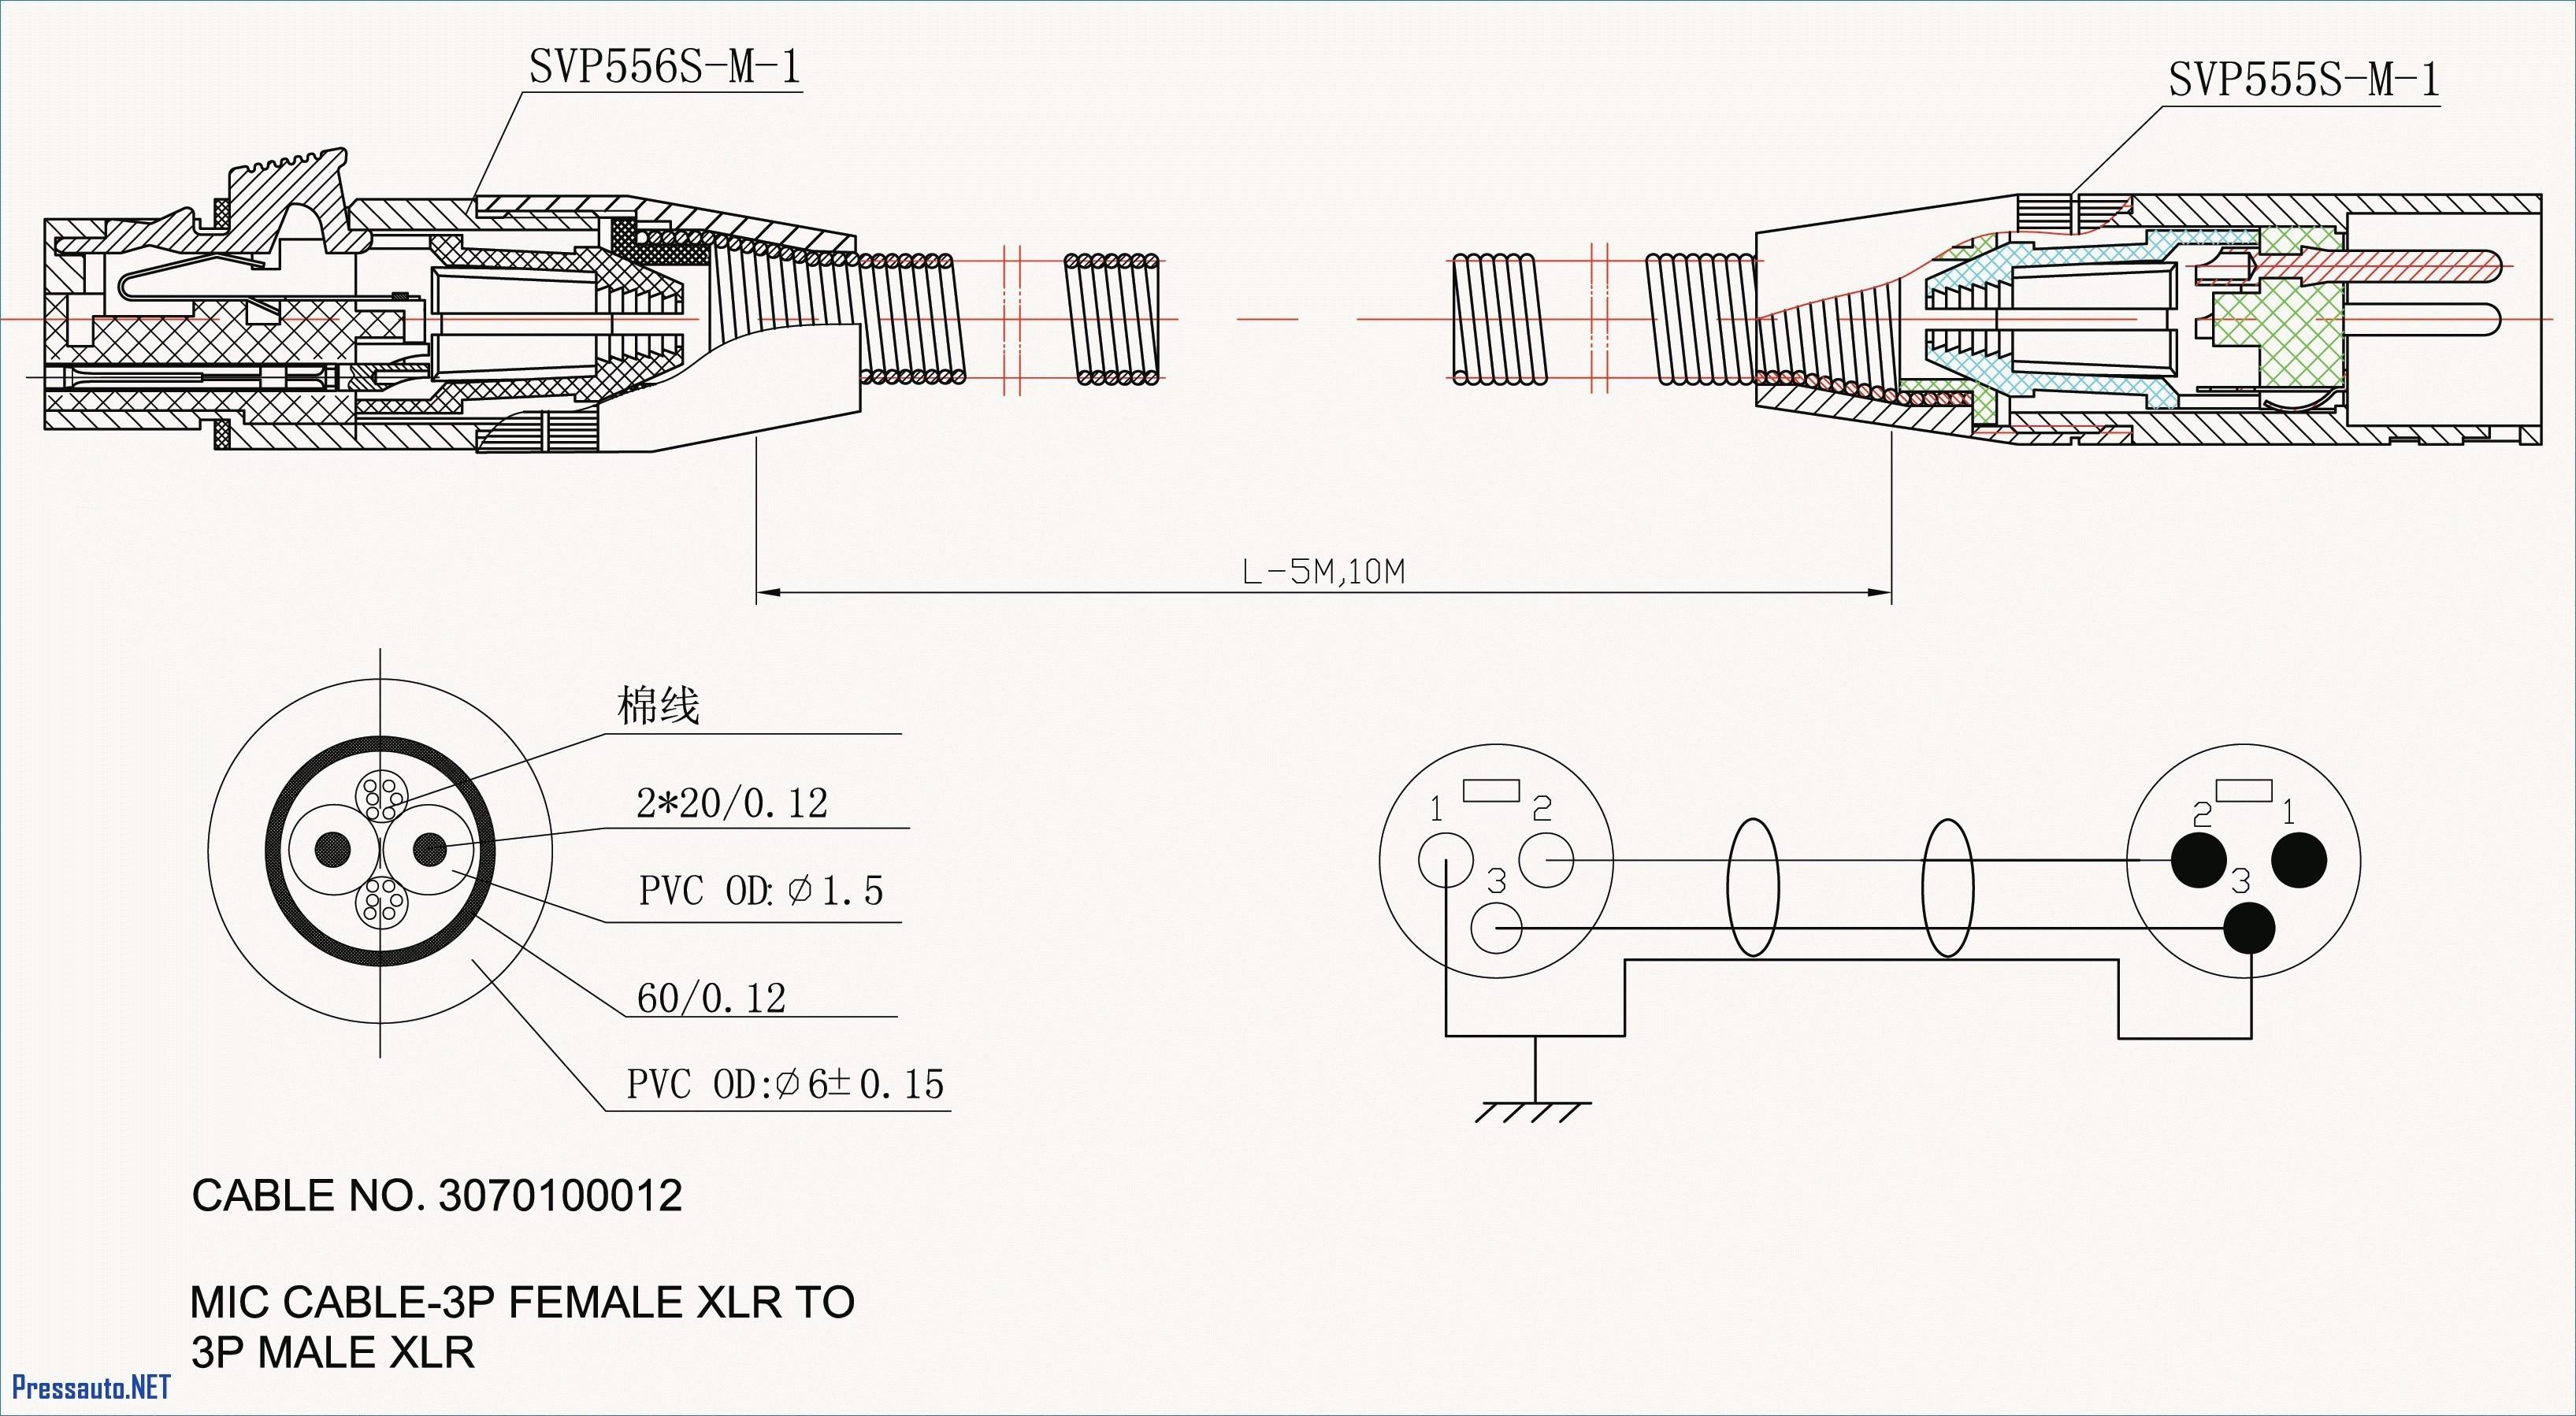 Toyota Corolla Engine Diagram Alternator Wiring Diagram toyota Pickup Fresh Corolla Wiring Diagram Of Toyota Corolla Engine Diagram